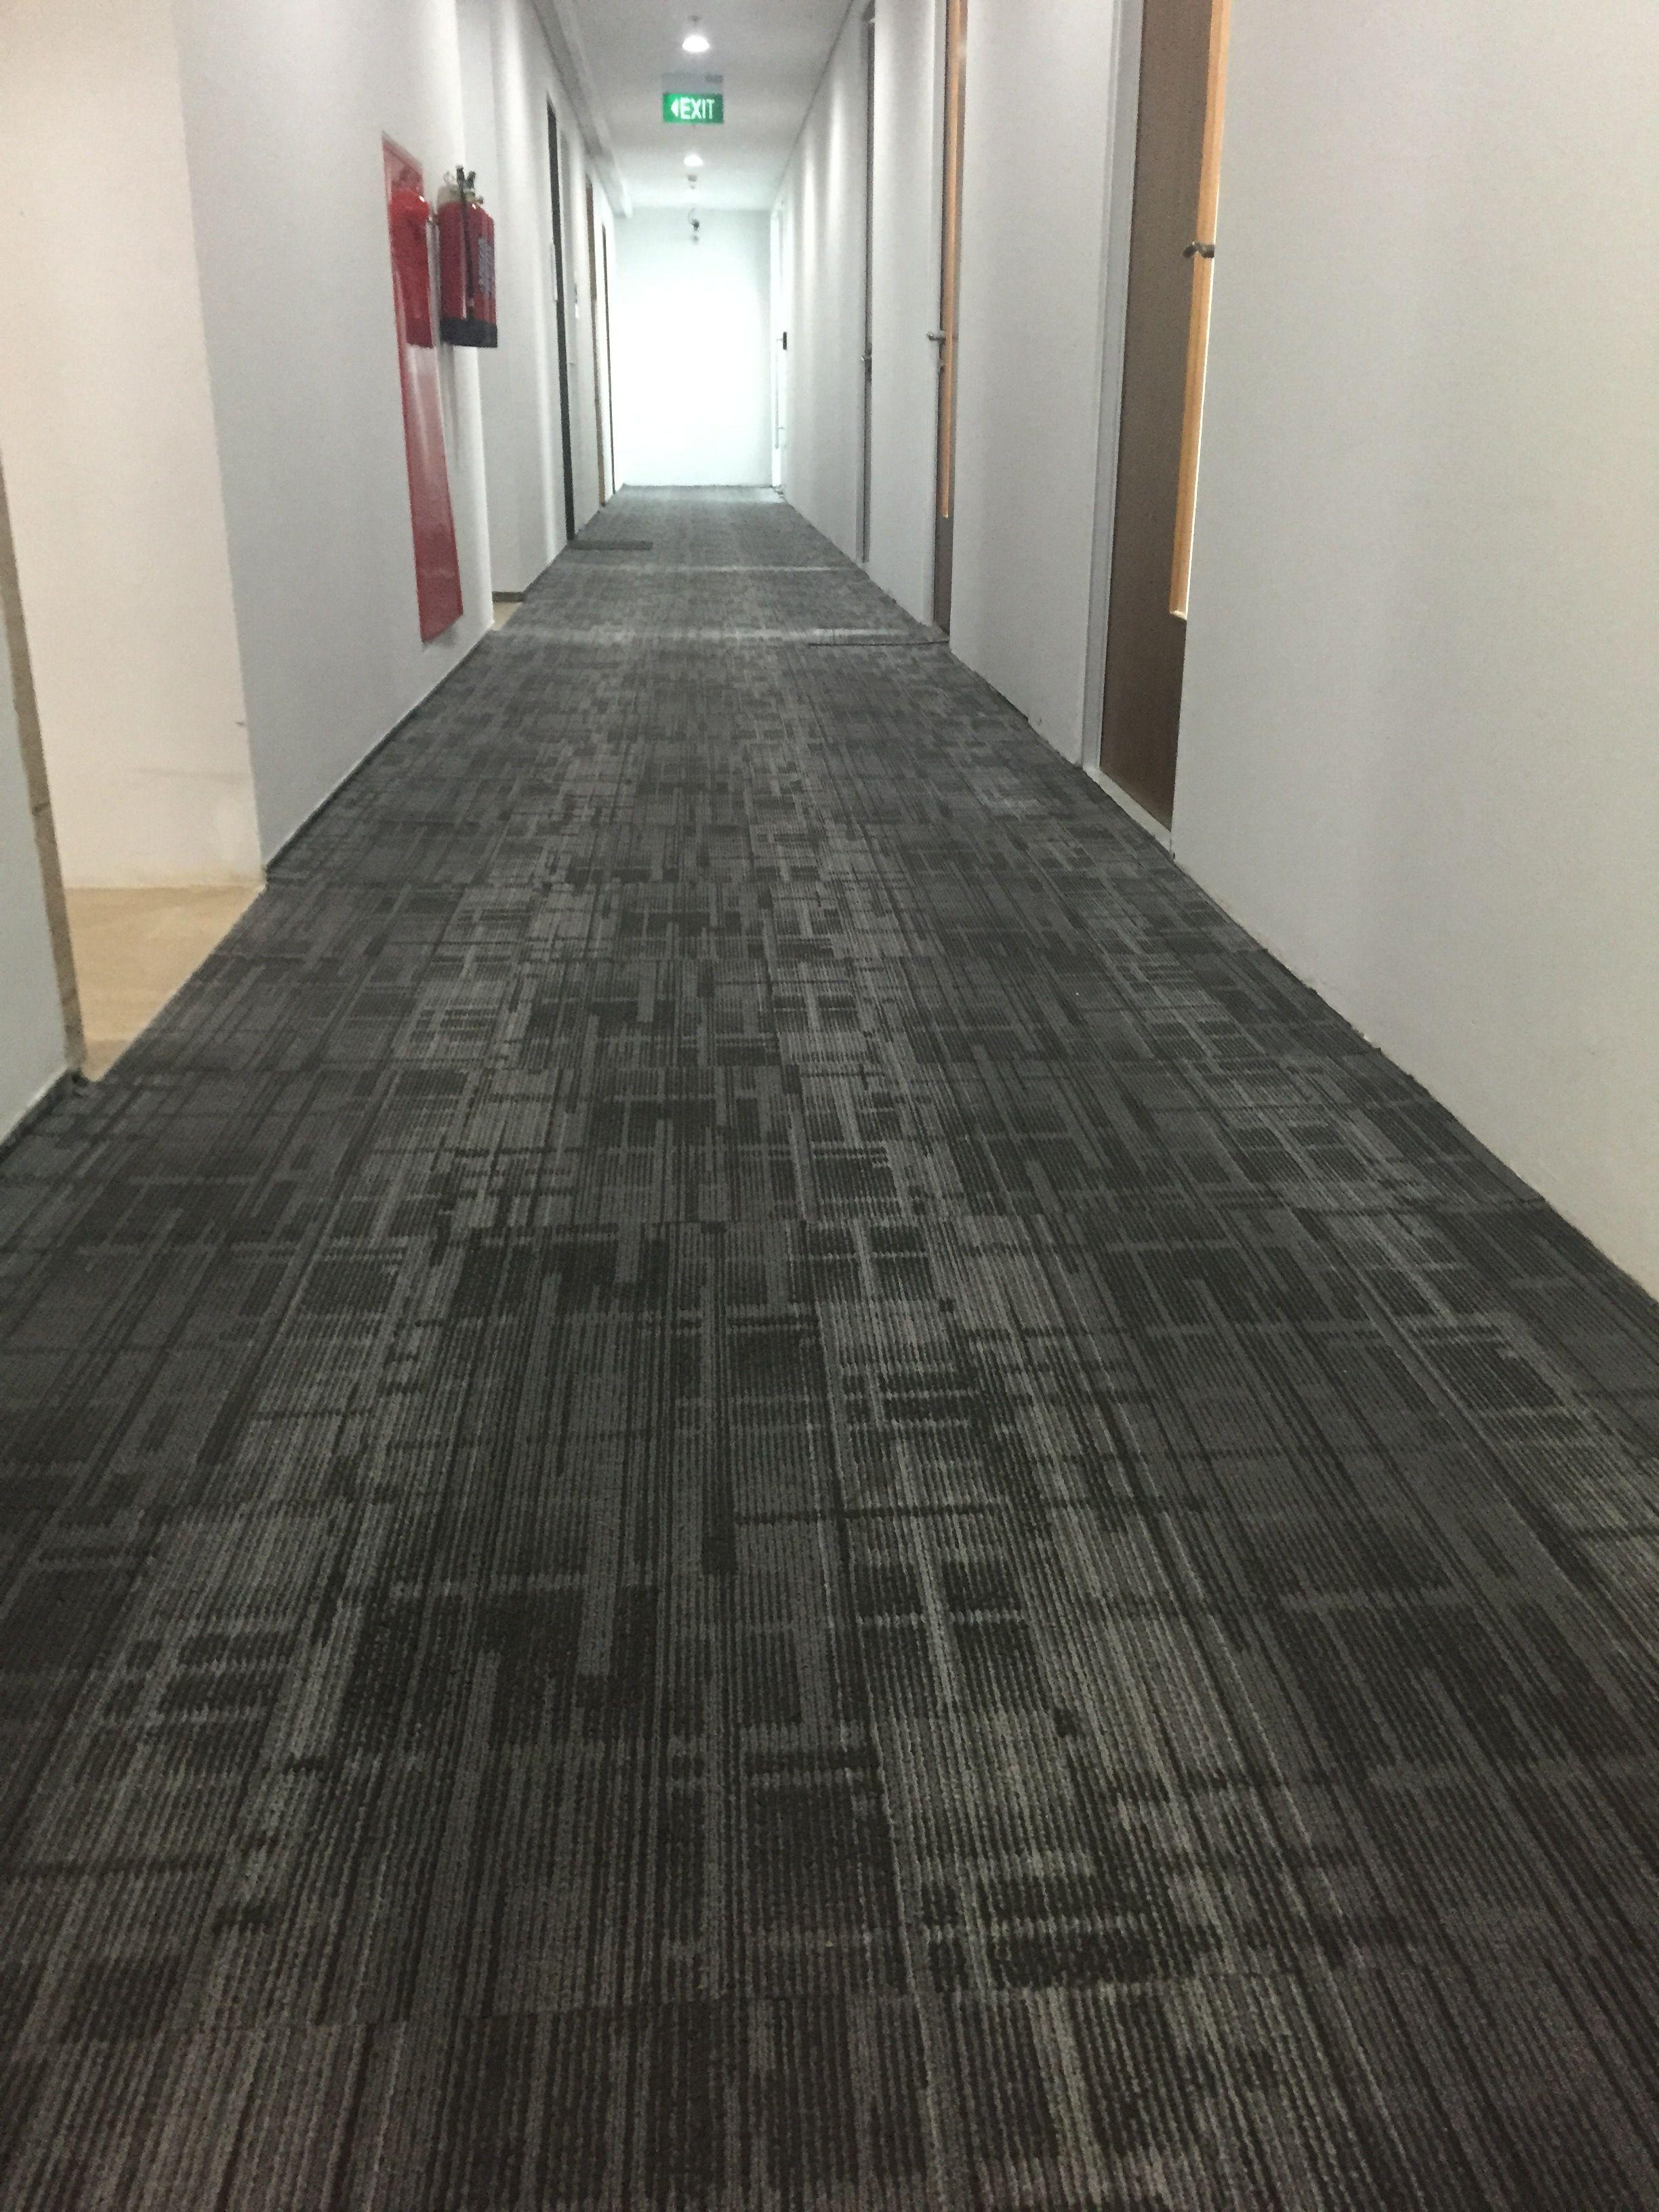 Lead The Way With Carpets Tiles Featuring A Recent Carpet Job At Menara Metropolitan Jakarta Office Building Carpet Design Condo Design Buying Carpet